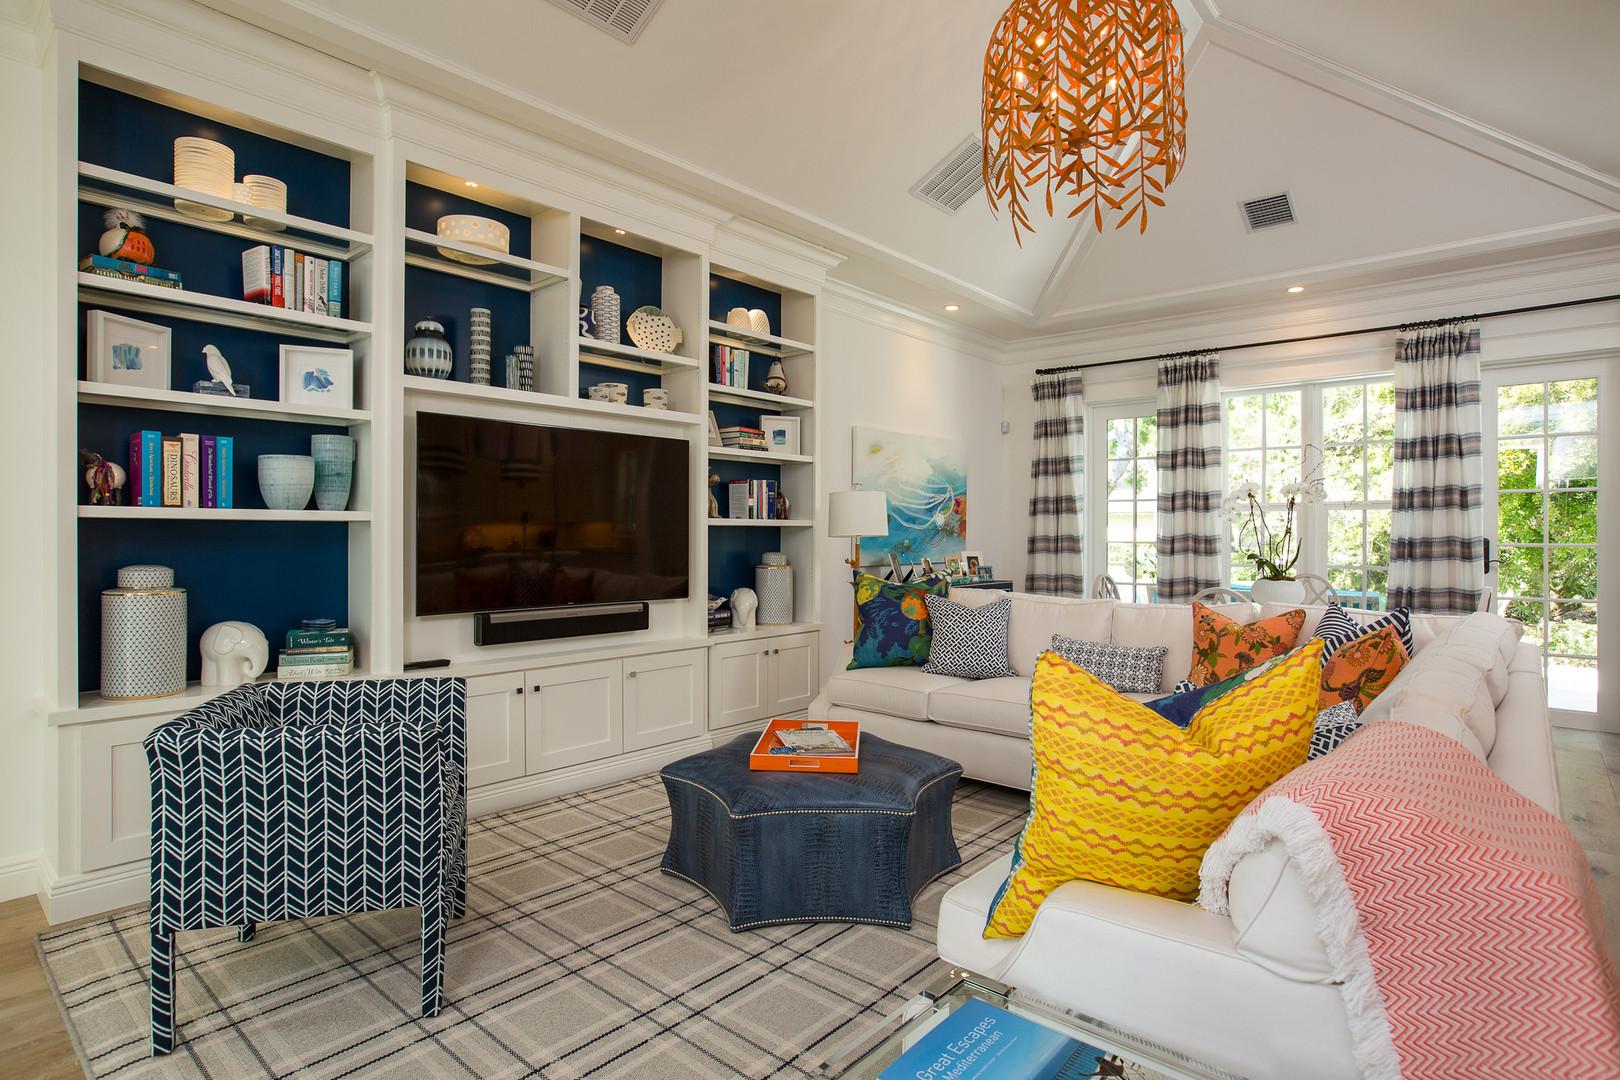 Living Room in Vero Beach by Interior Designer Tiffany Sweeney Decor Envy 09